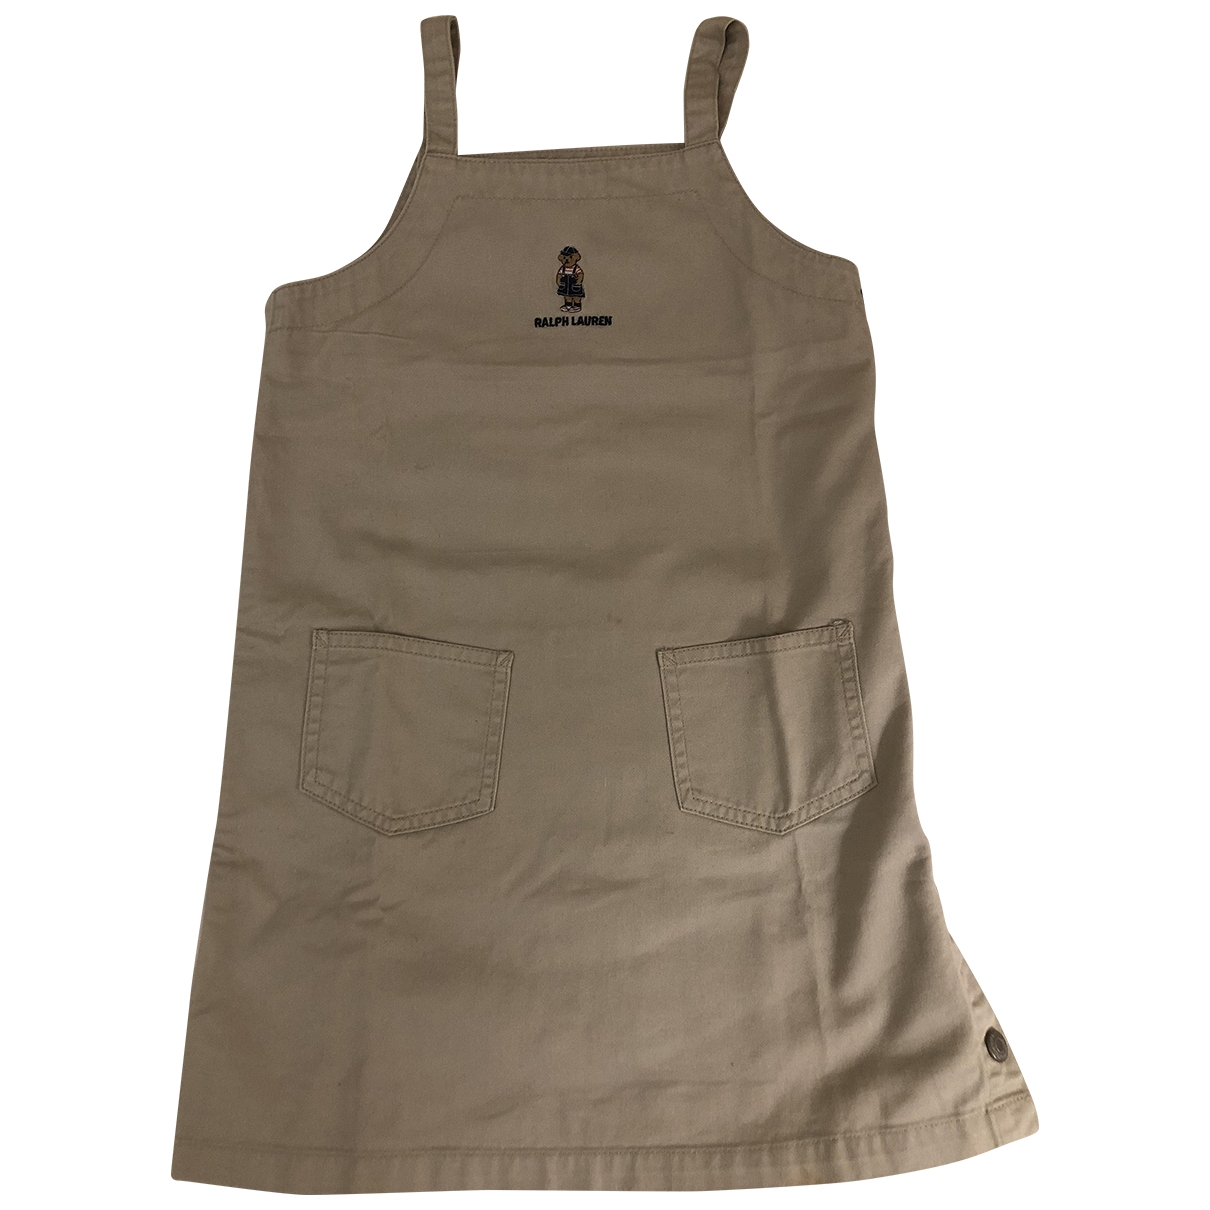 Ralph Lauren \N Beige Cotton dress for Kids 6 years - until 45 inches UK